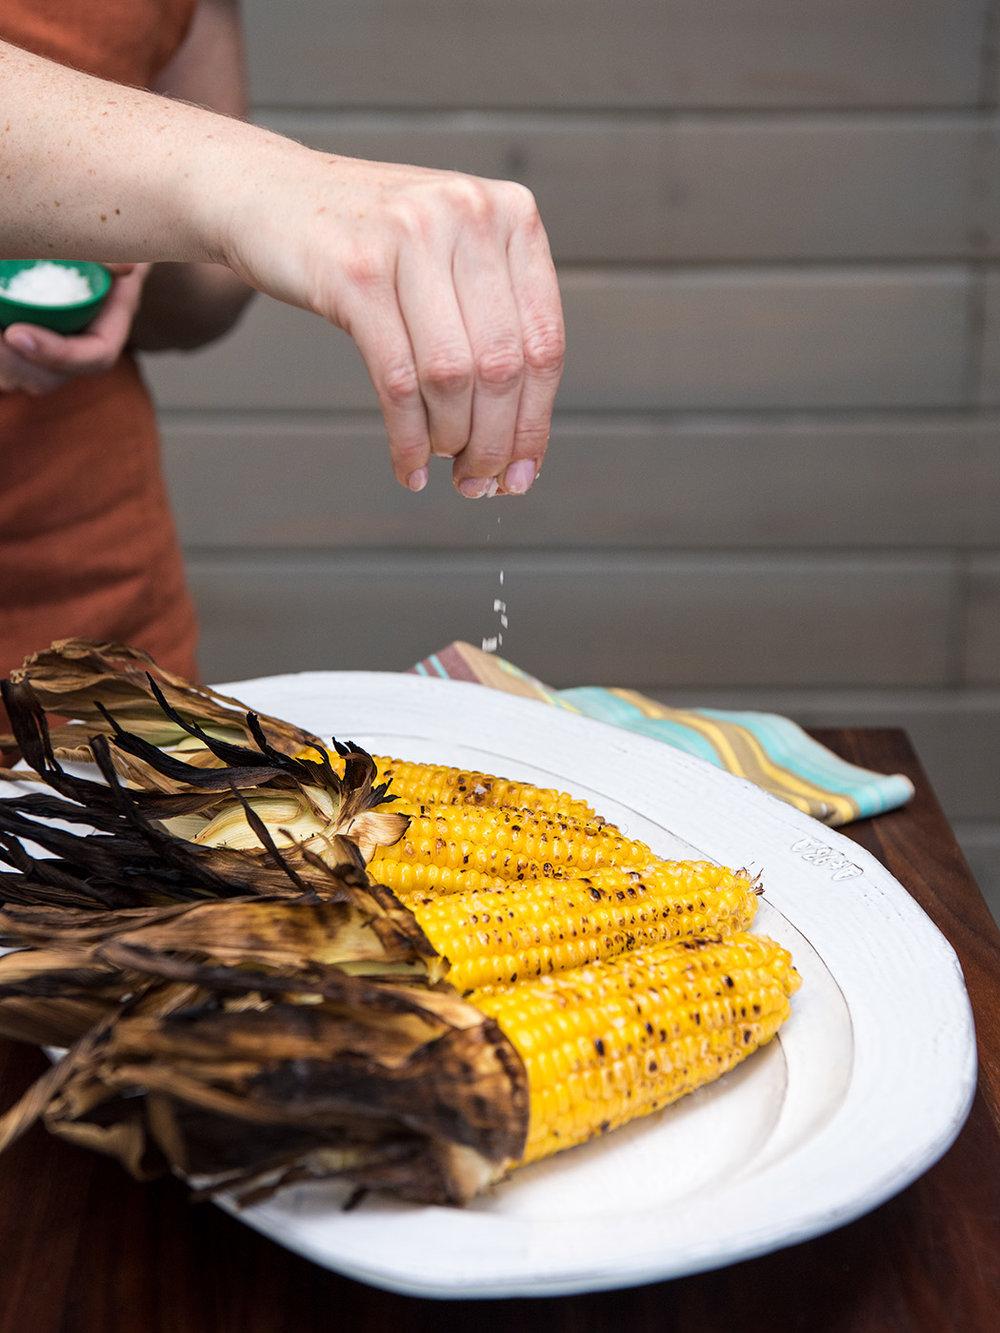 Deborah_Farnault_Food_Network_How-To-Win-Summer-How-To-Cook-Corn-Salting-3x4-0984 copy.jpg